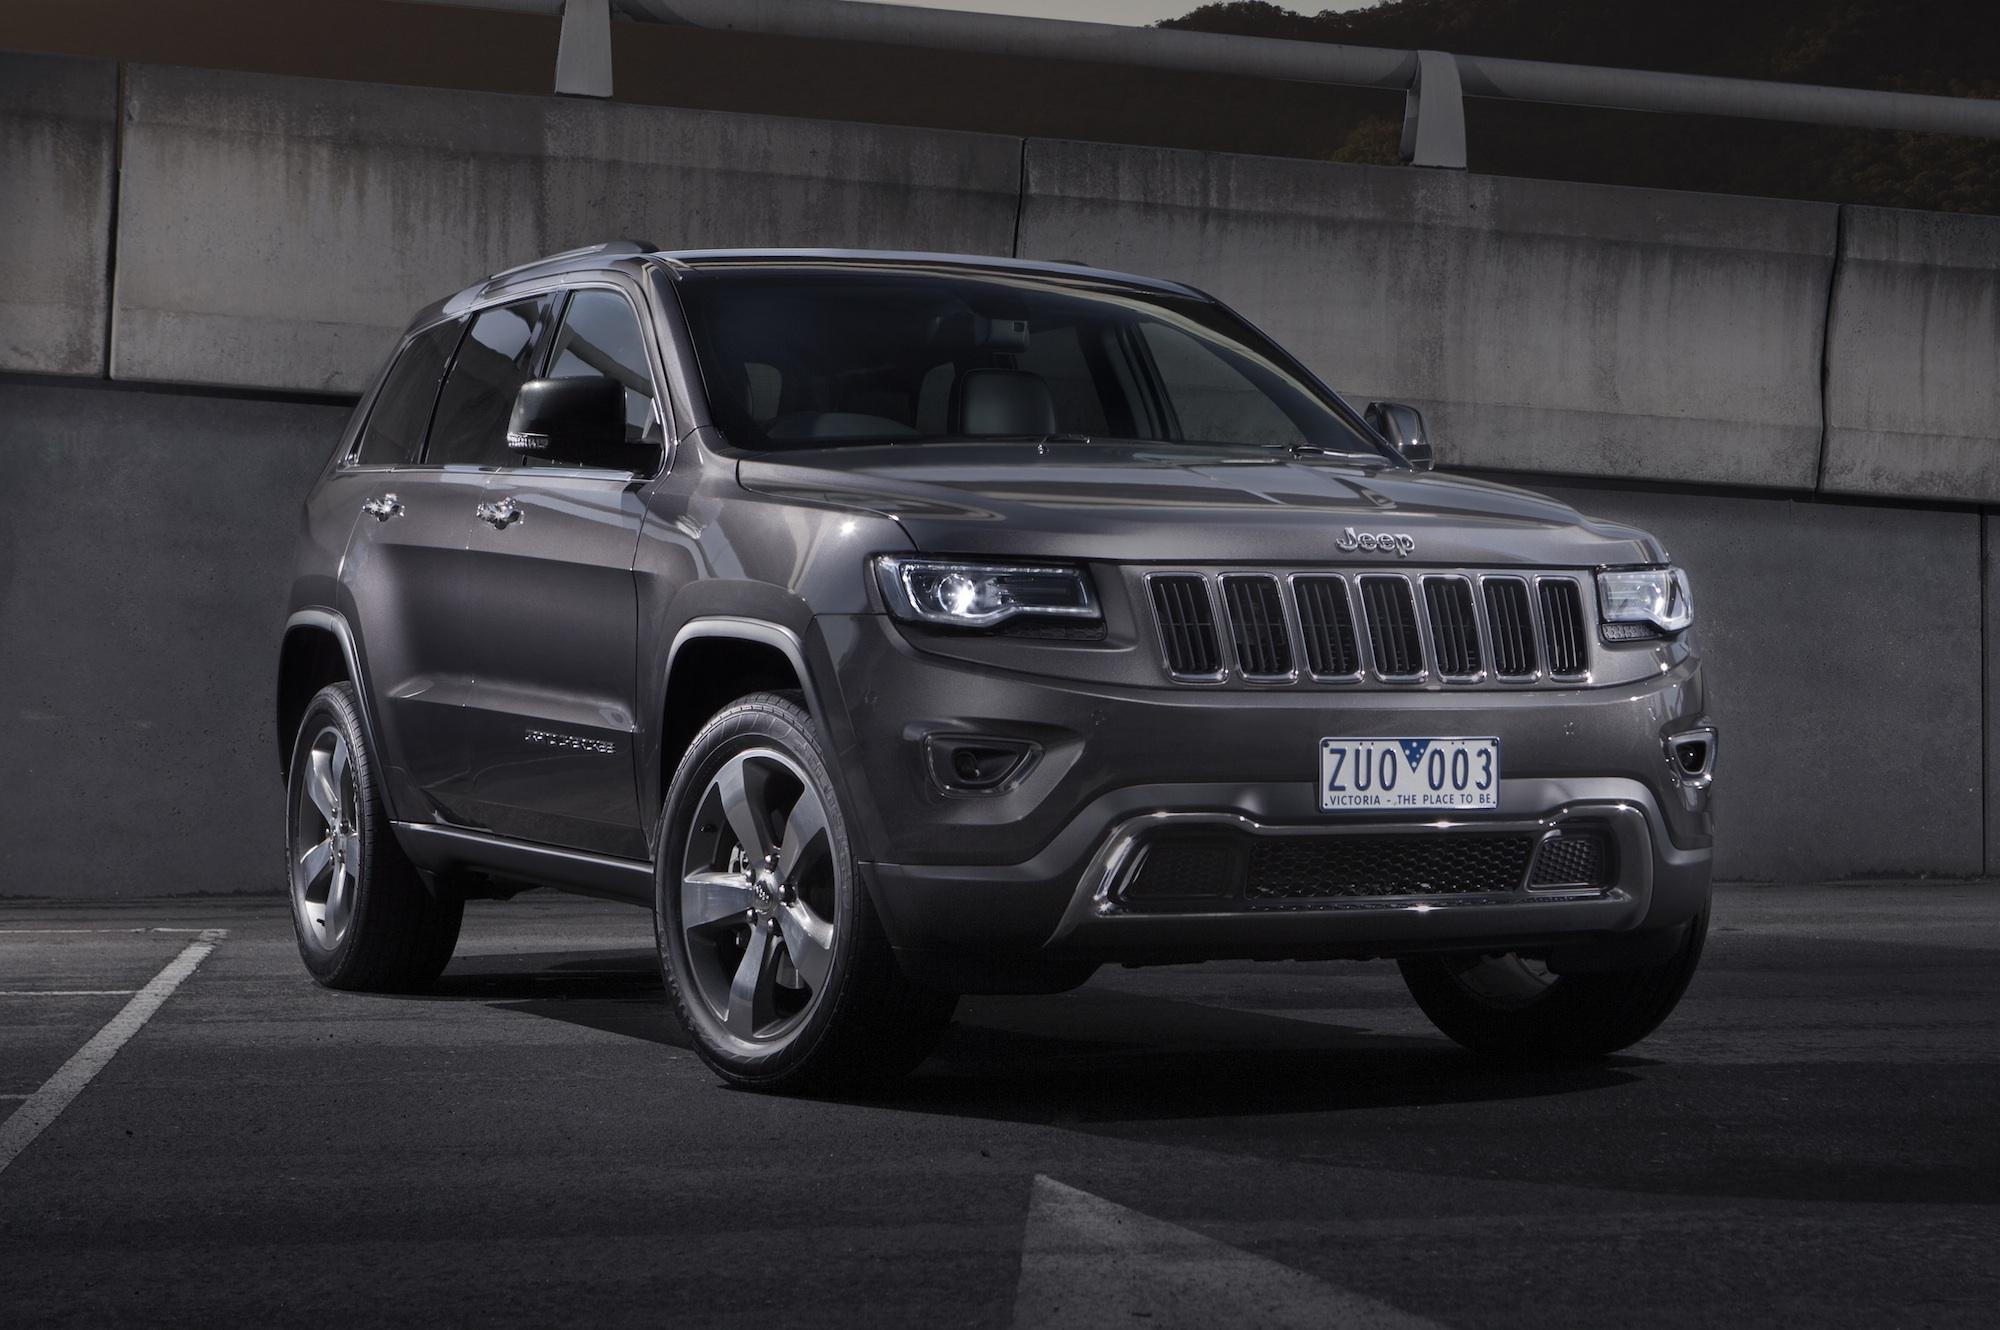 2013 Jeep Grand Cherokee Review Photos Caradvice